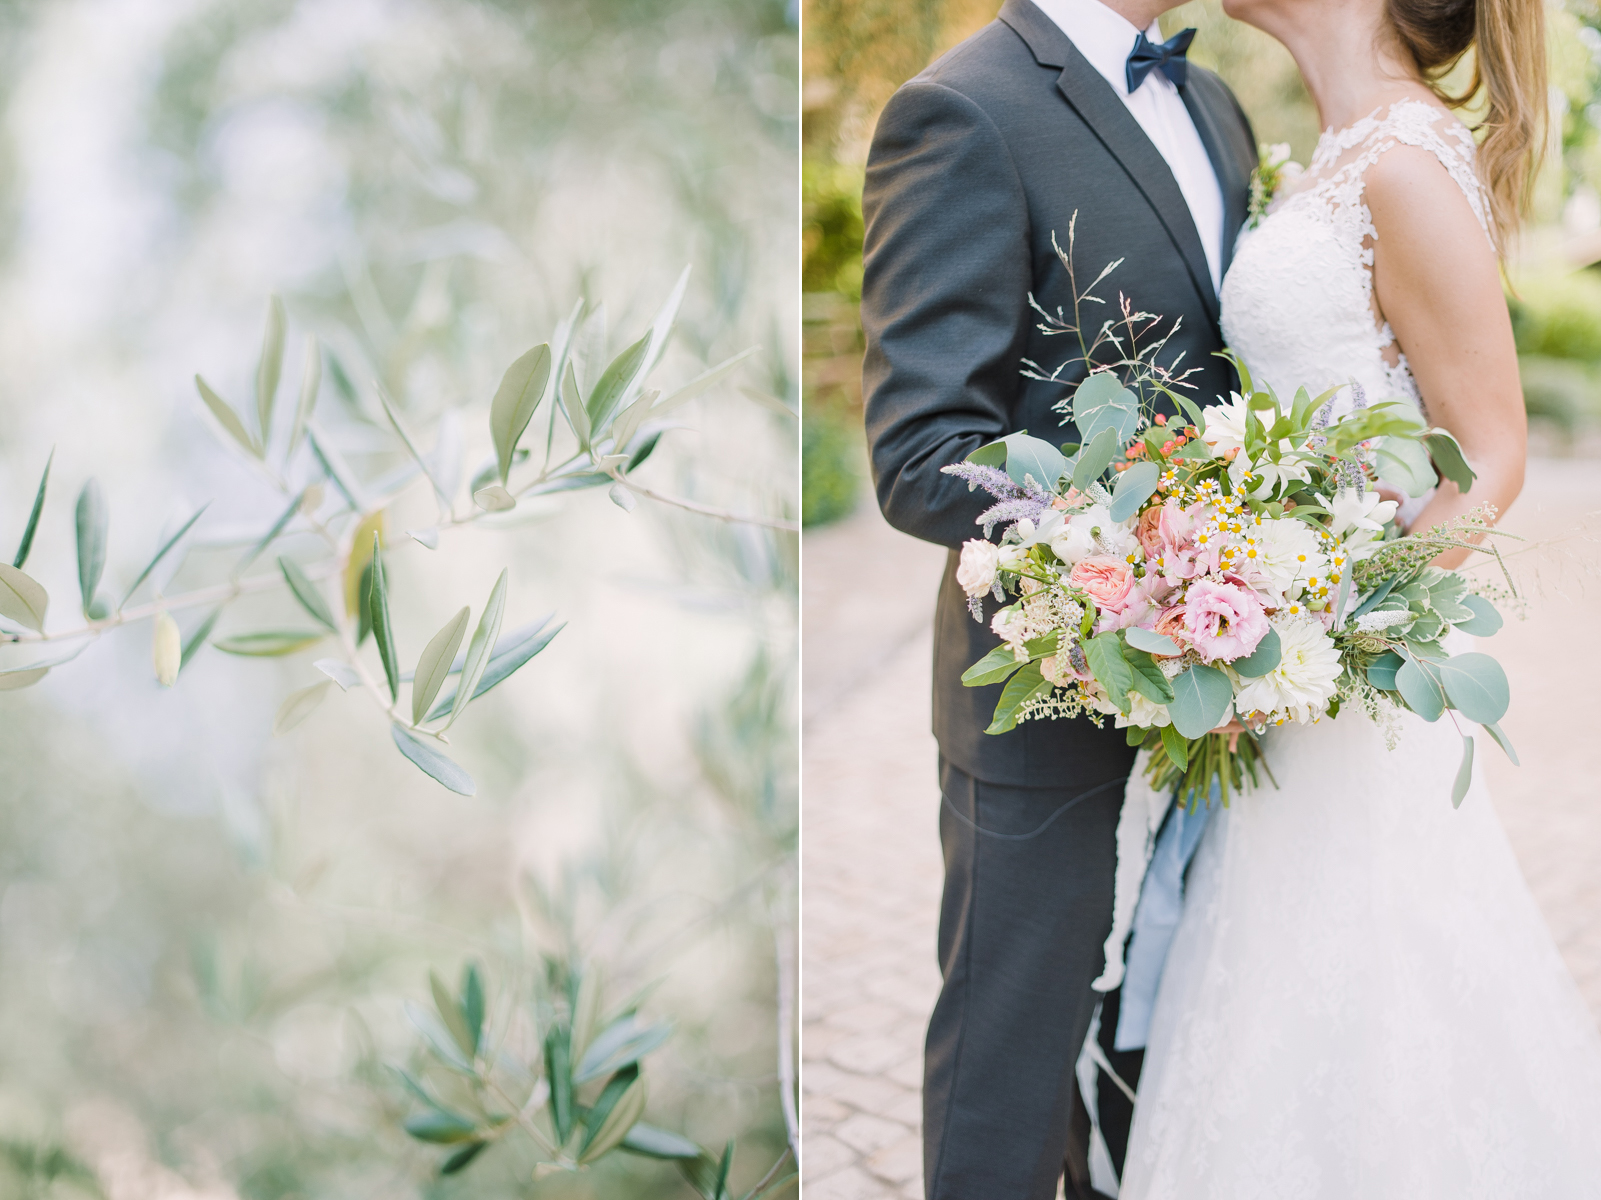 BohemeMoonPhotography-Grasse-provence-wedding-photographer_15.jpg